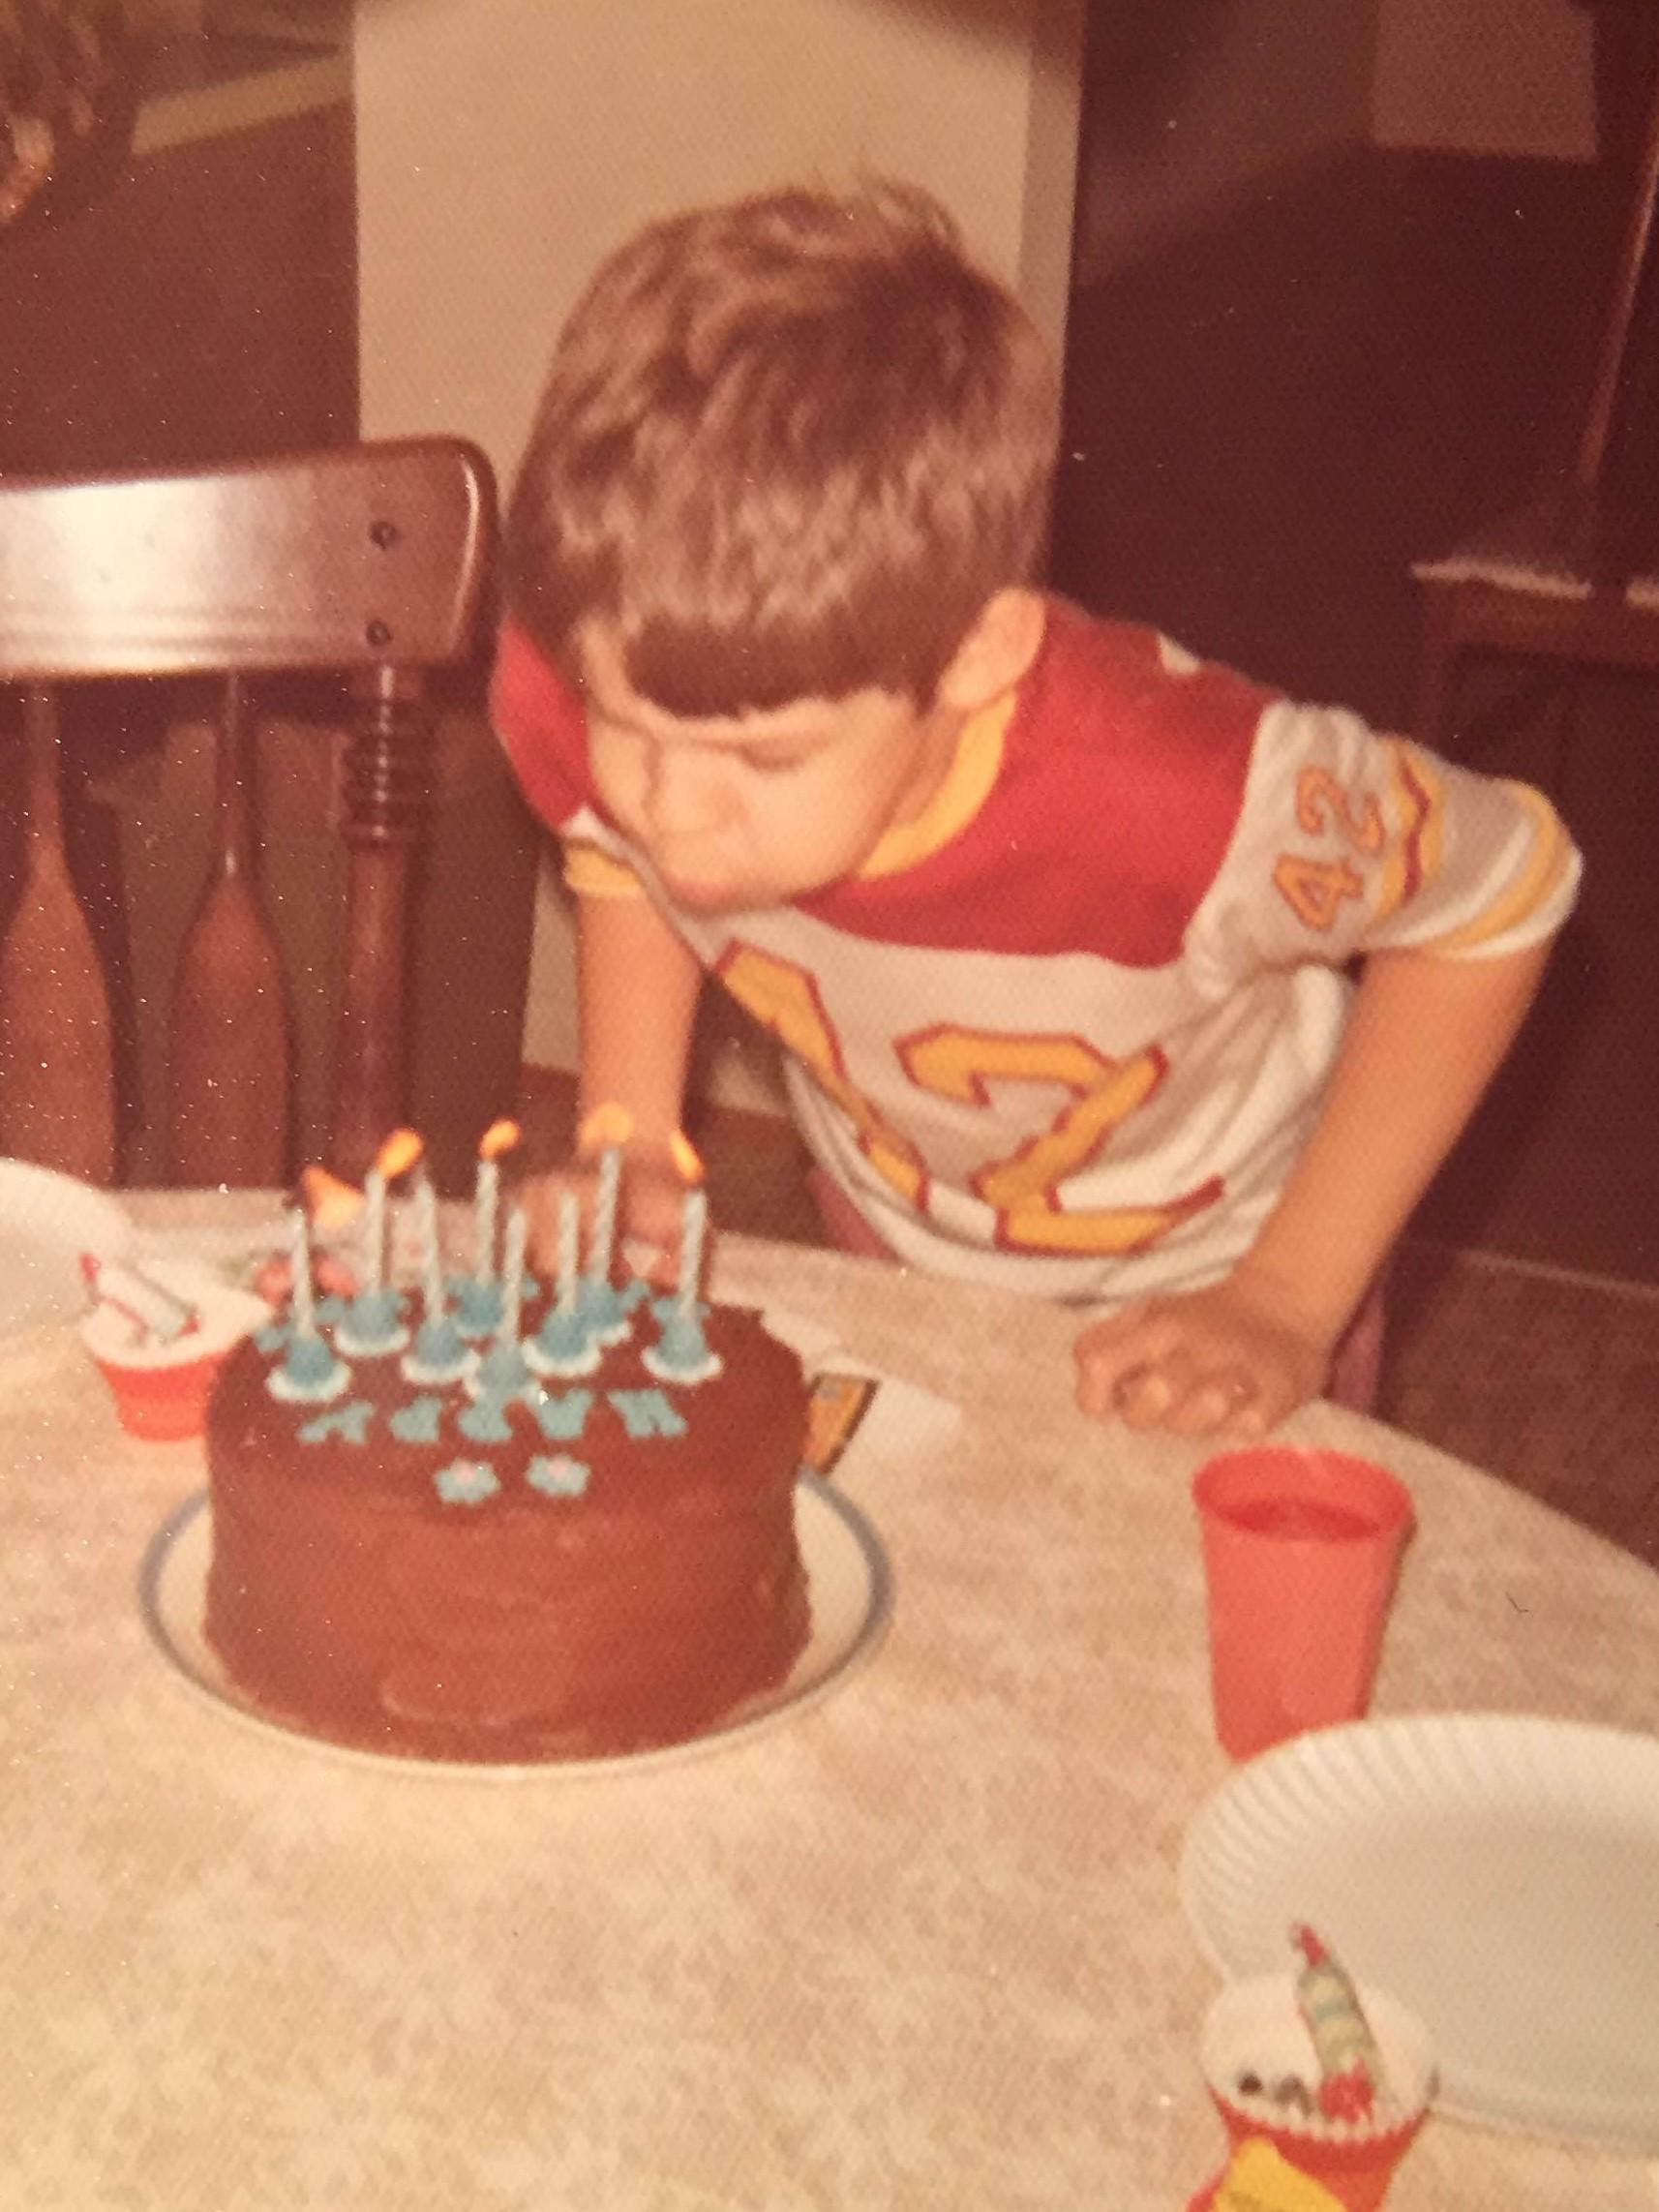 Eighth birthday. Not traumatic.